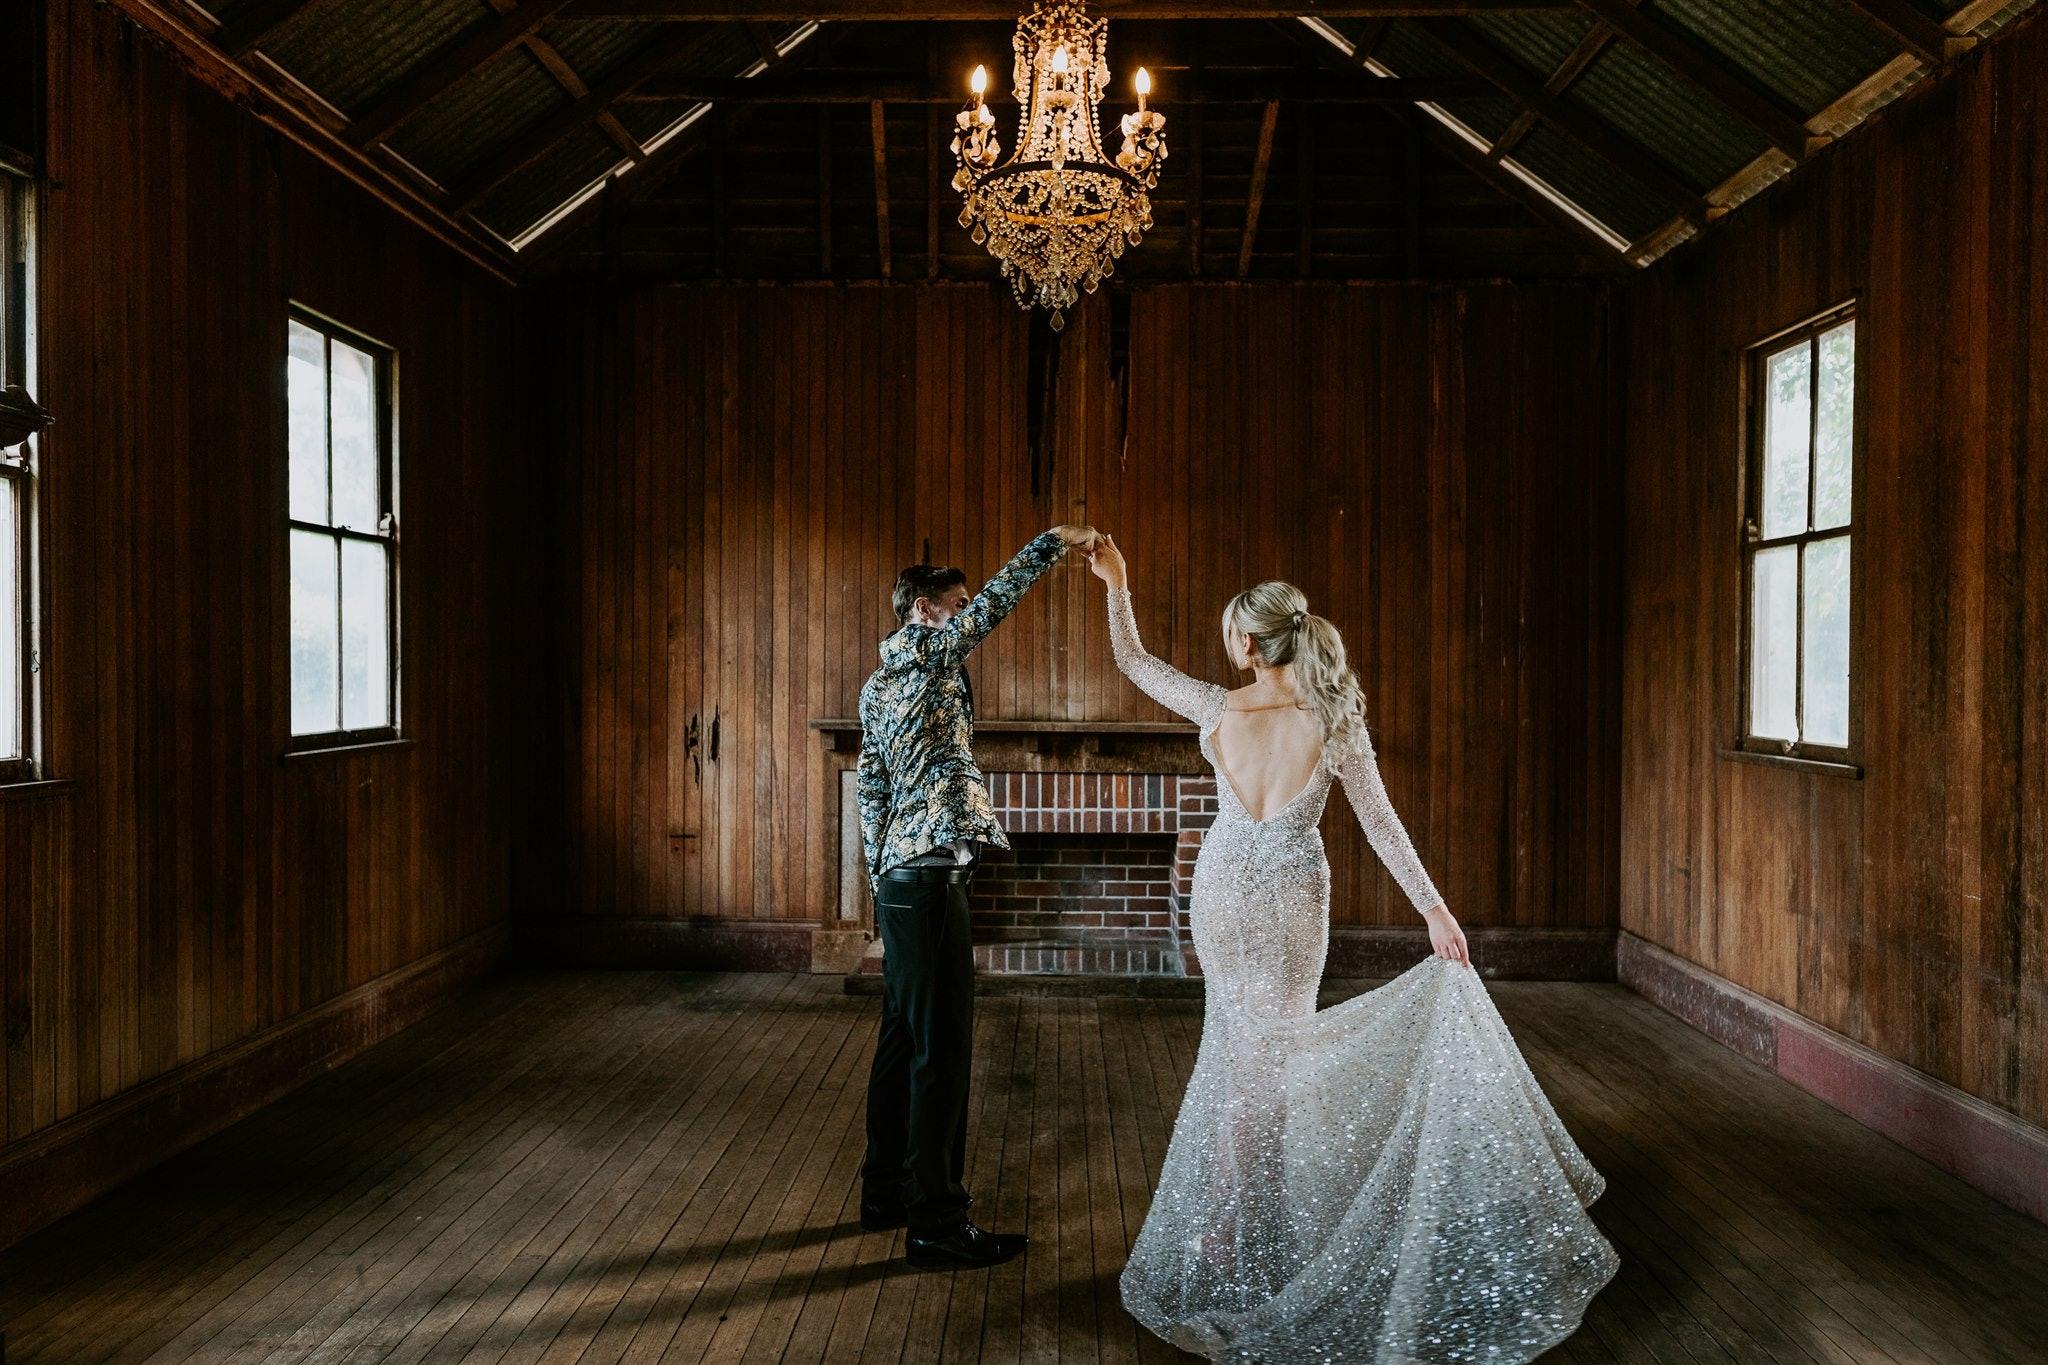 Bride and Groom dancing in Old School House